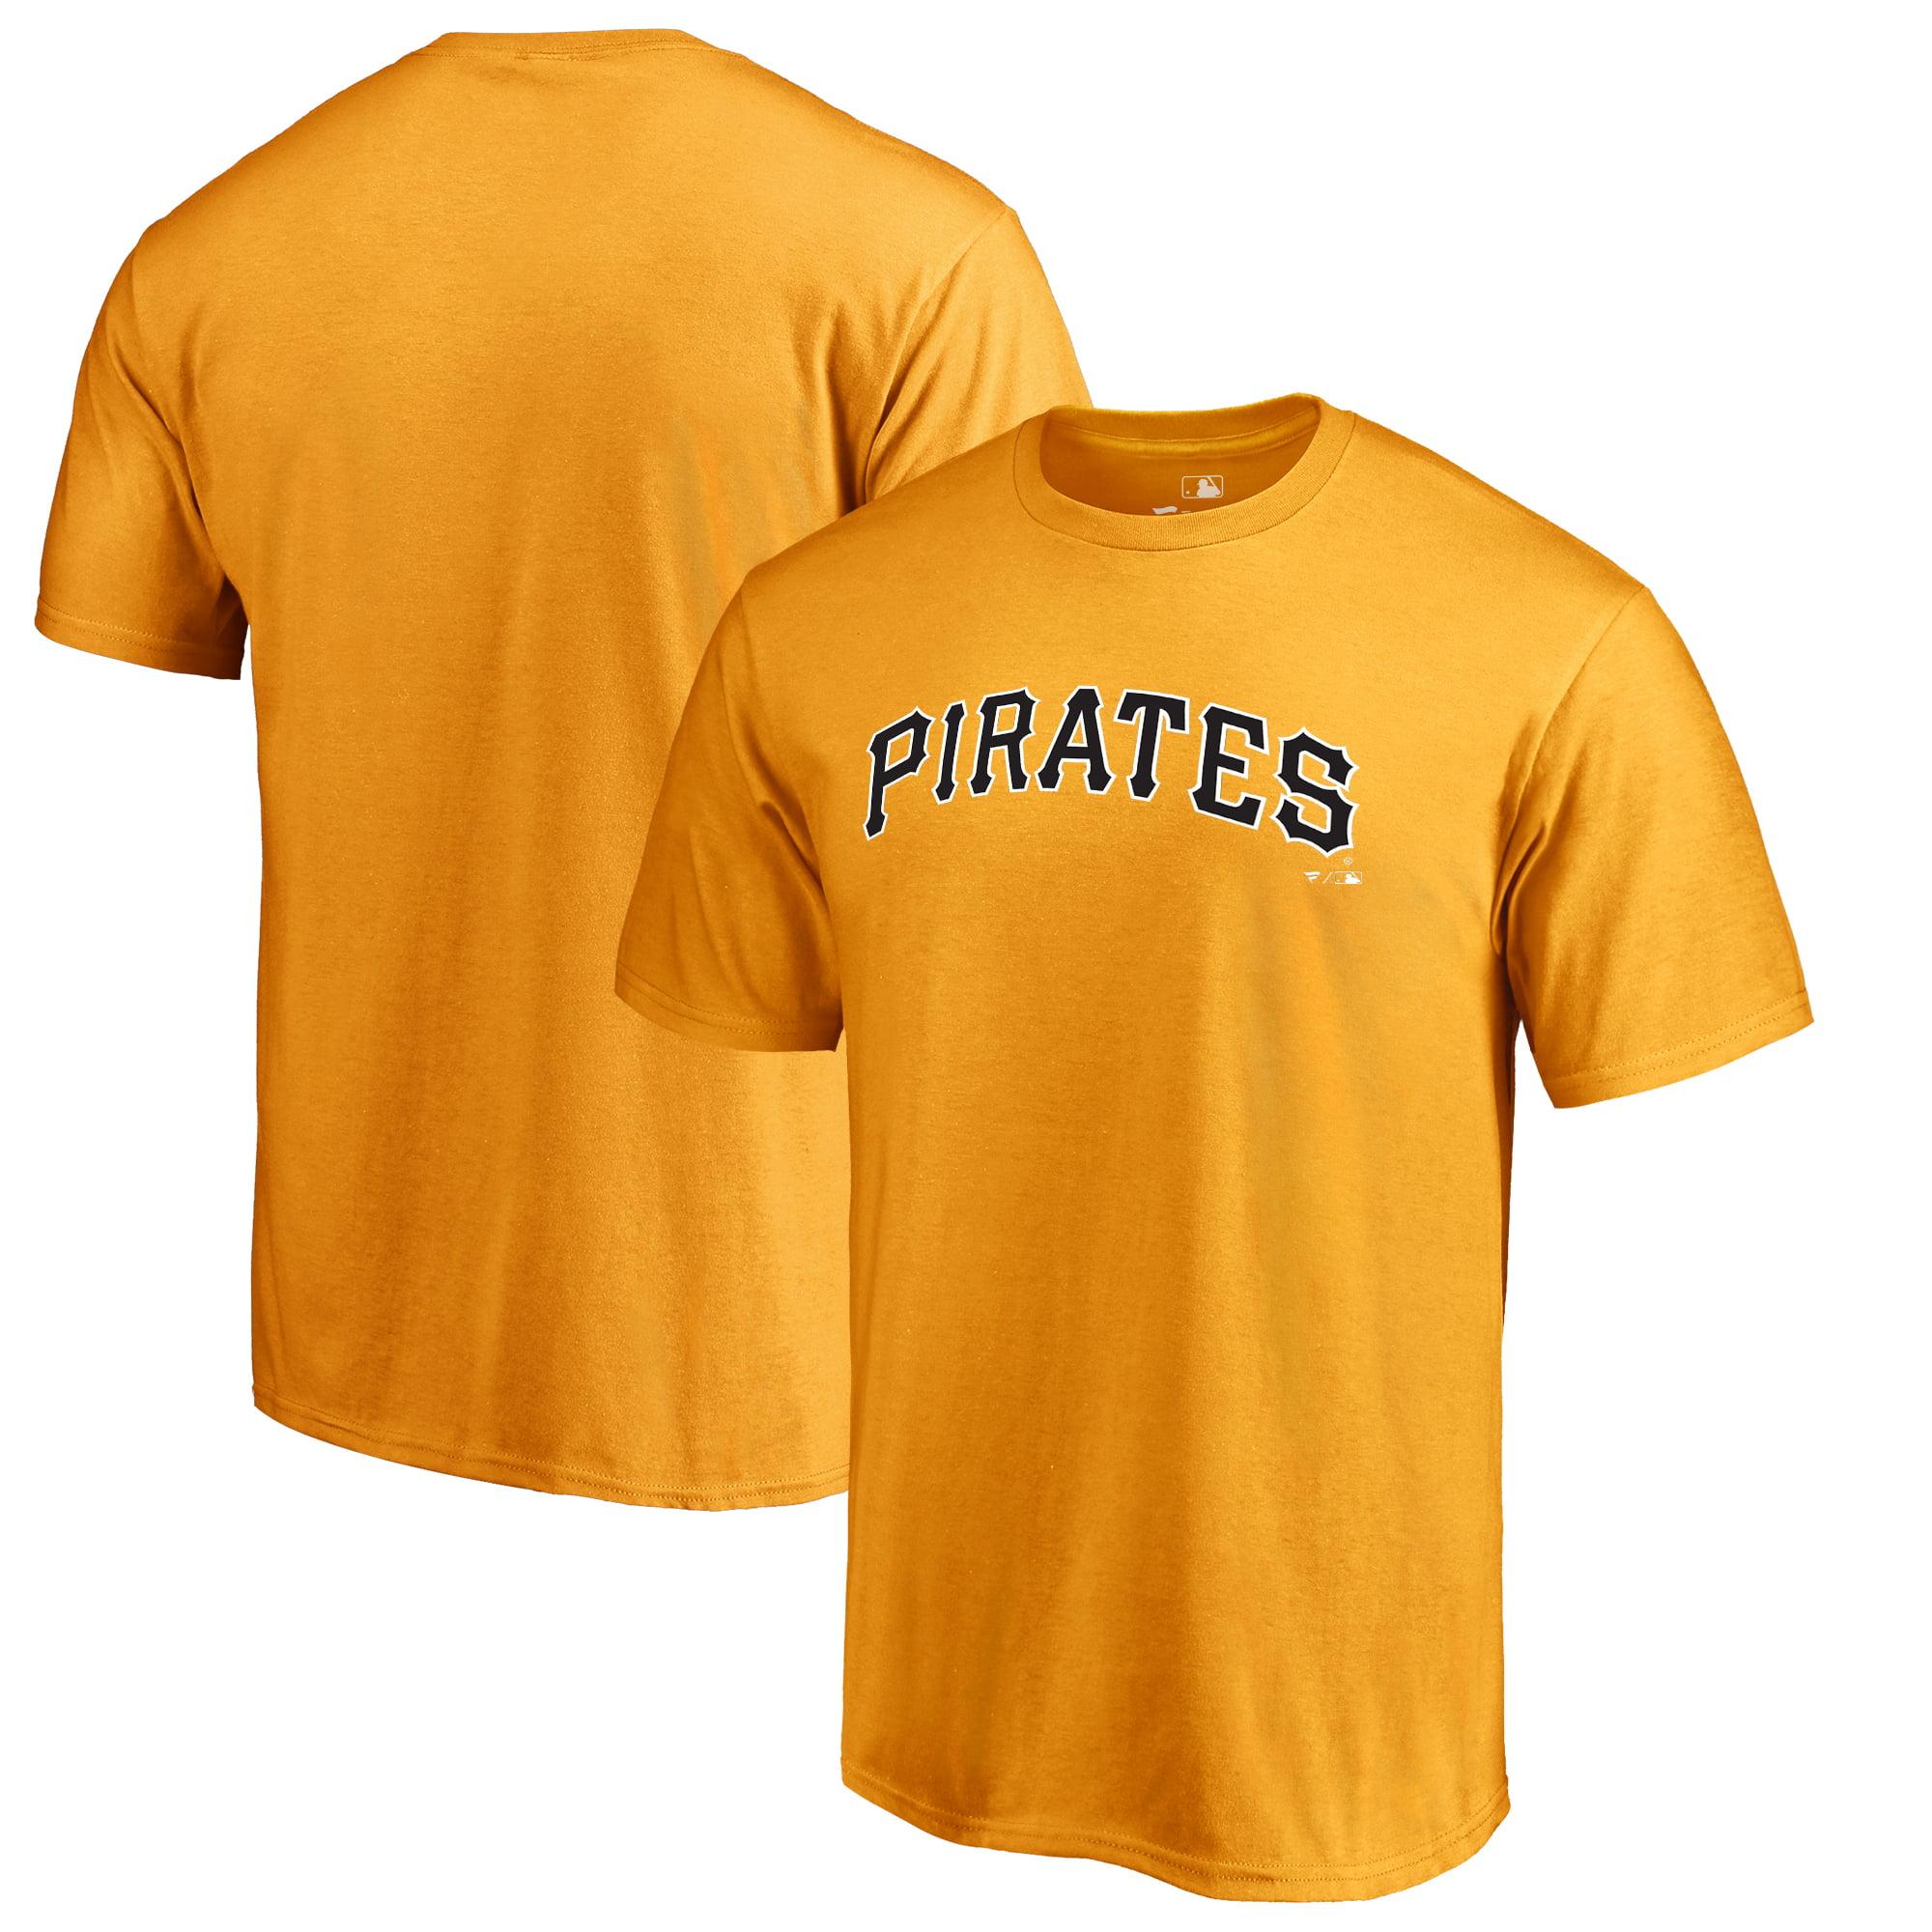 Pittsburgh Pirates Fanatics Branded Team Wordmark T-Shirt - Gold